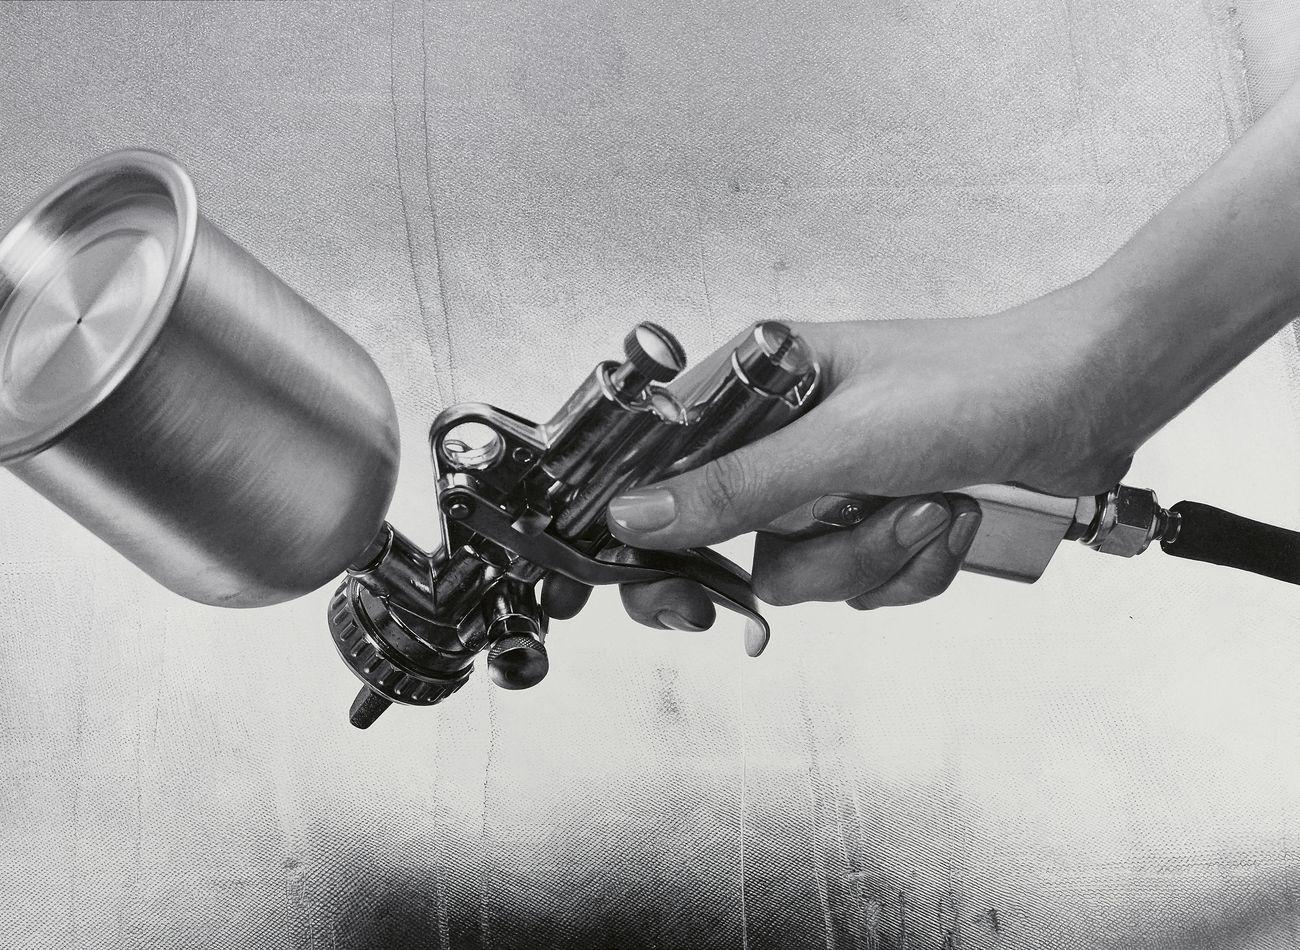 Istruzioni per un vero artista. Un grande Rudolf Stingel in mostra alla Fondazione Beyeler di Basilea